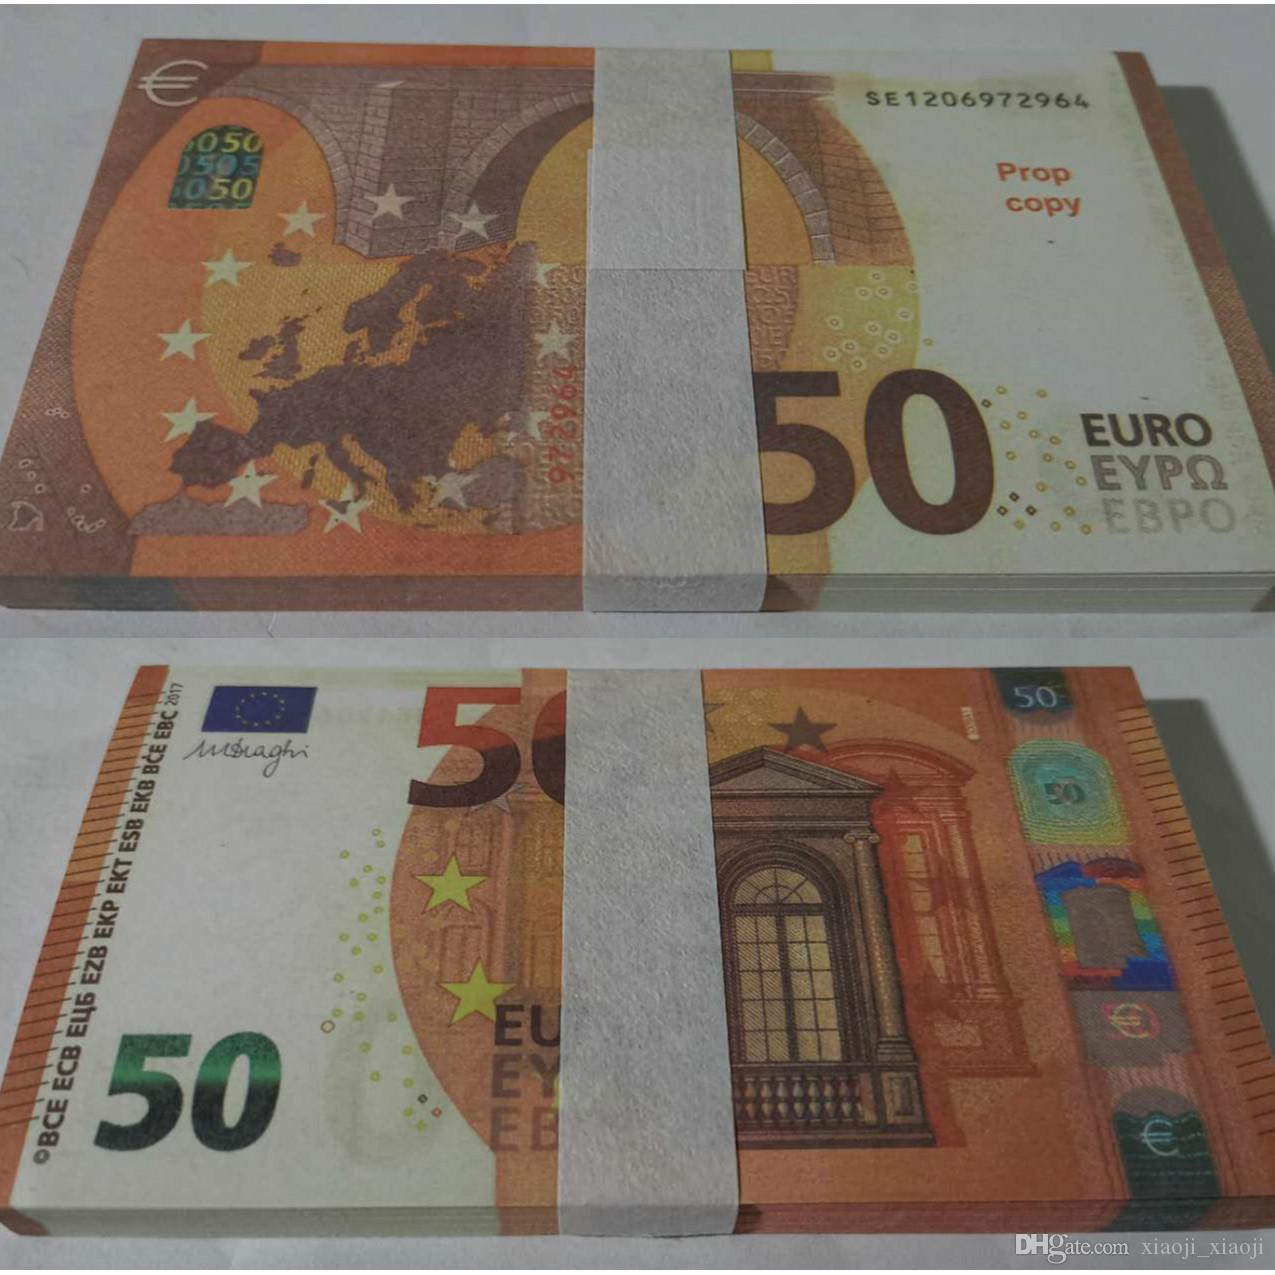 BankNote Festival Collections Faux Party Pop Giocattolo Best 50 copia denaro denaro Billet Billet Bambini Stage Presents Euro Trick Holiday Prop Curre Gliv.